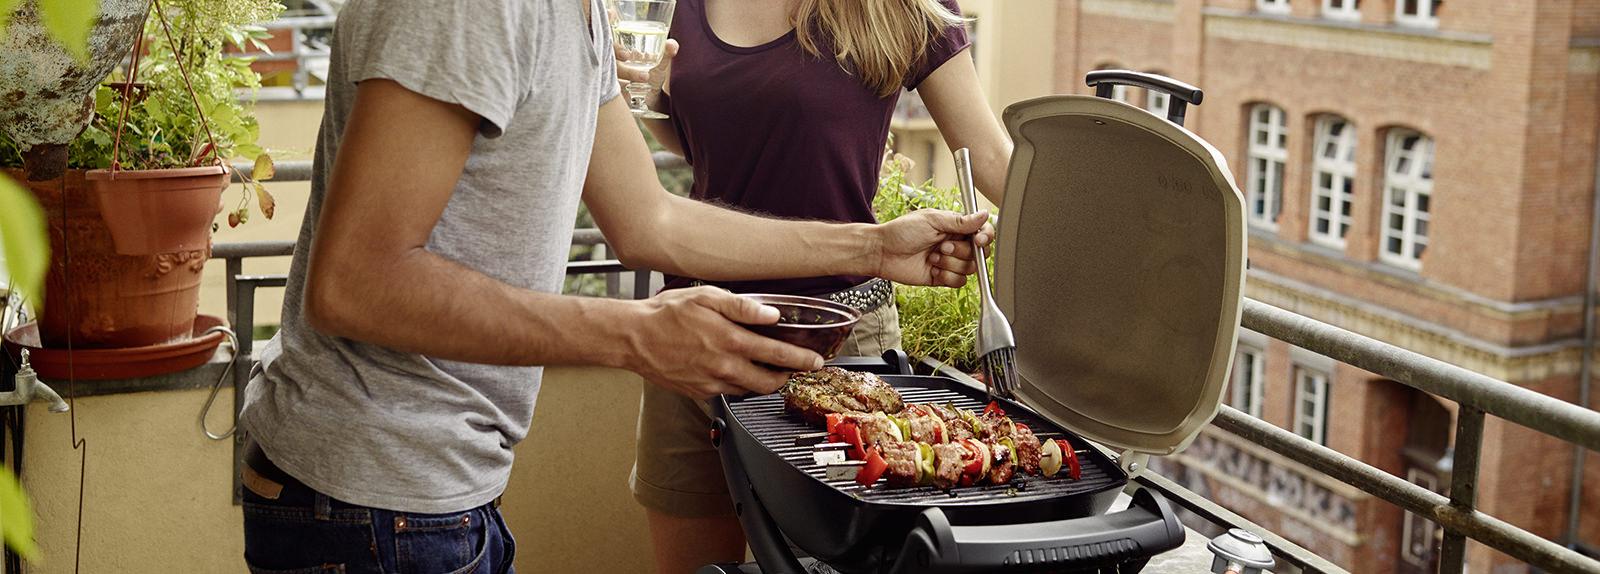 Barbecue Comparatif Meilleur Barbecue Charbon Gaz